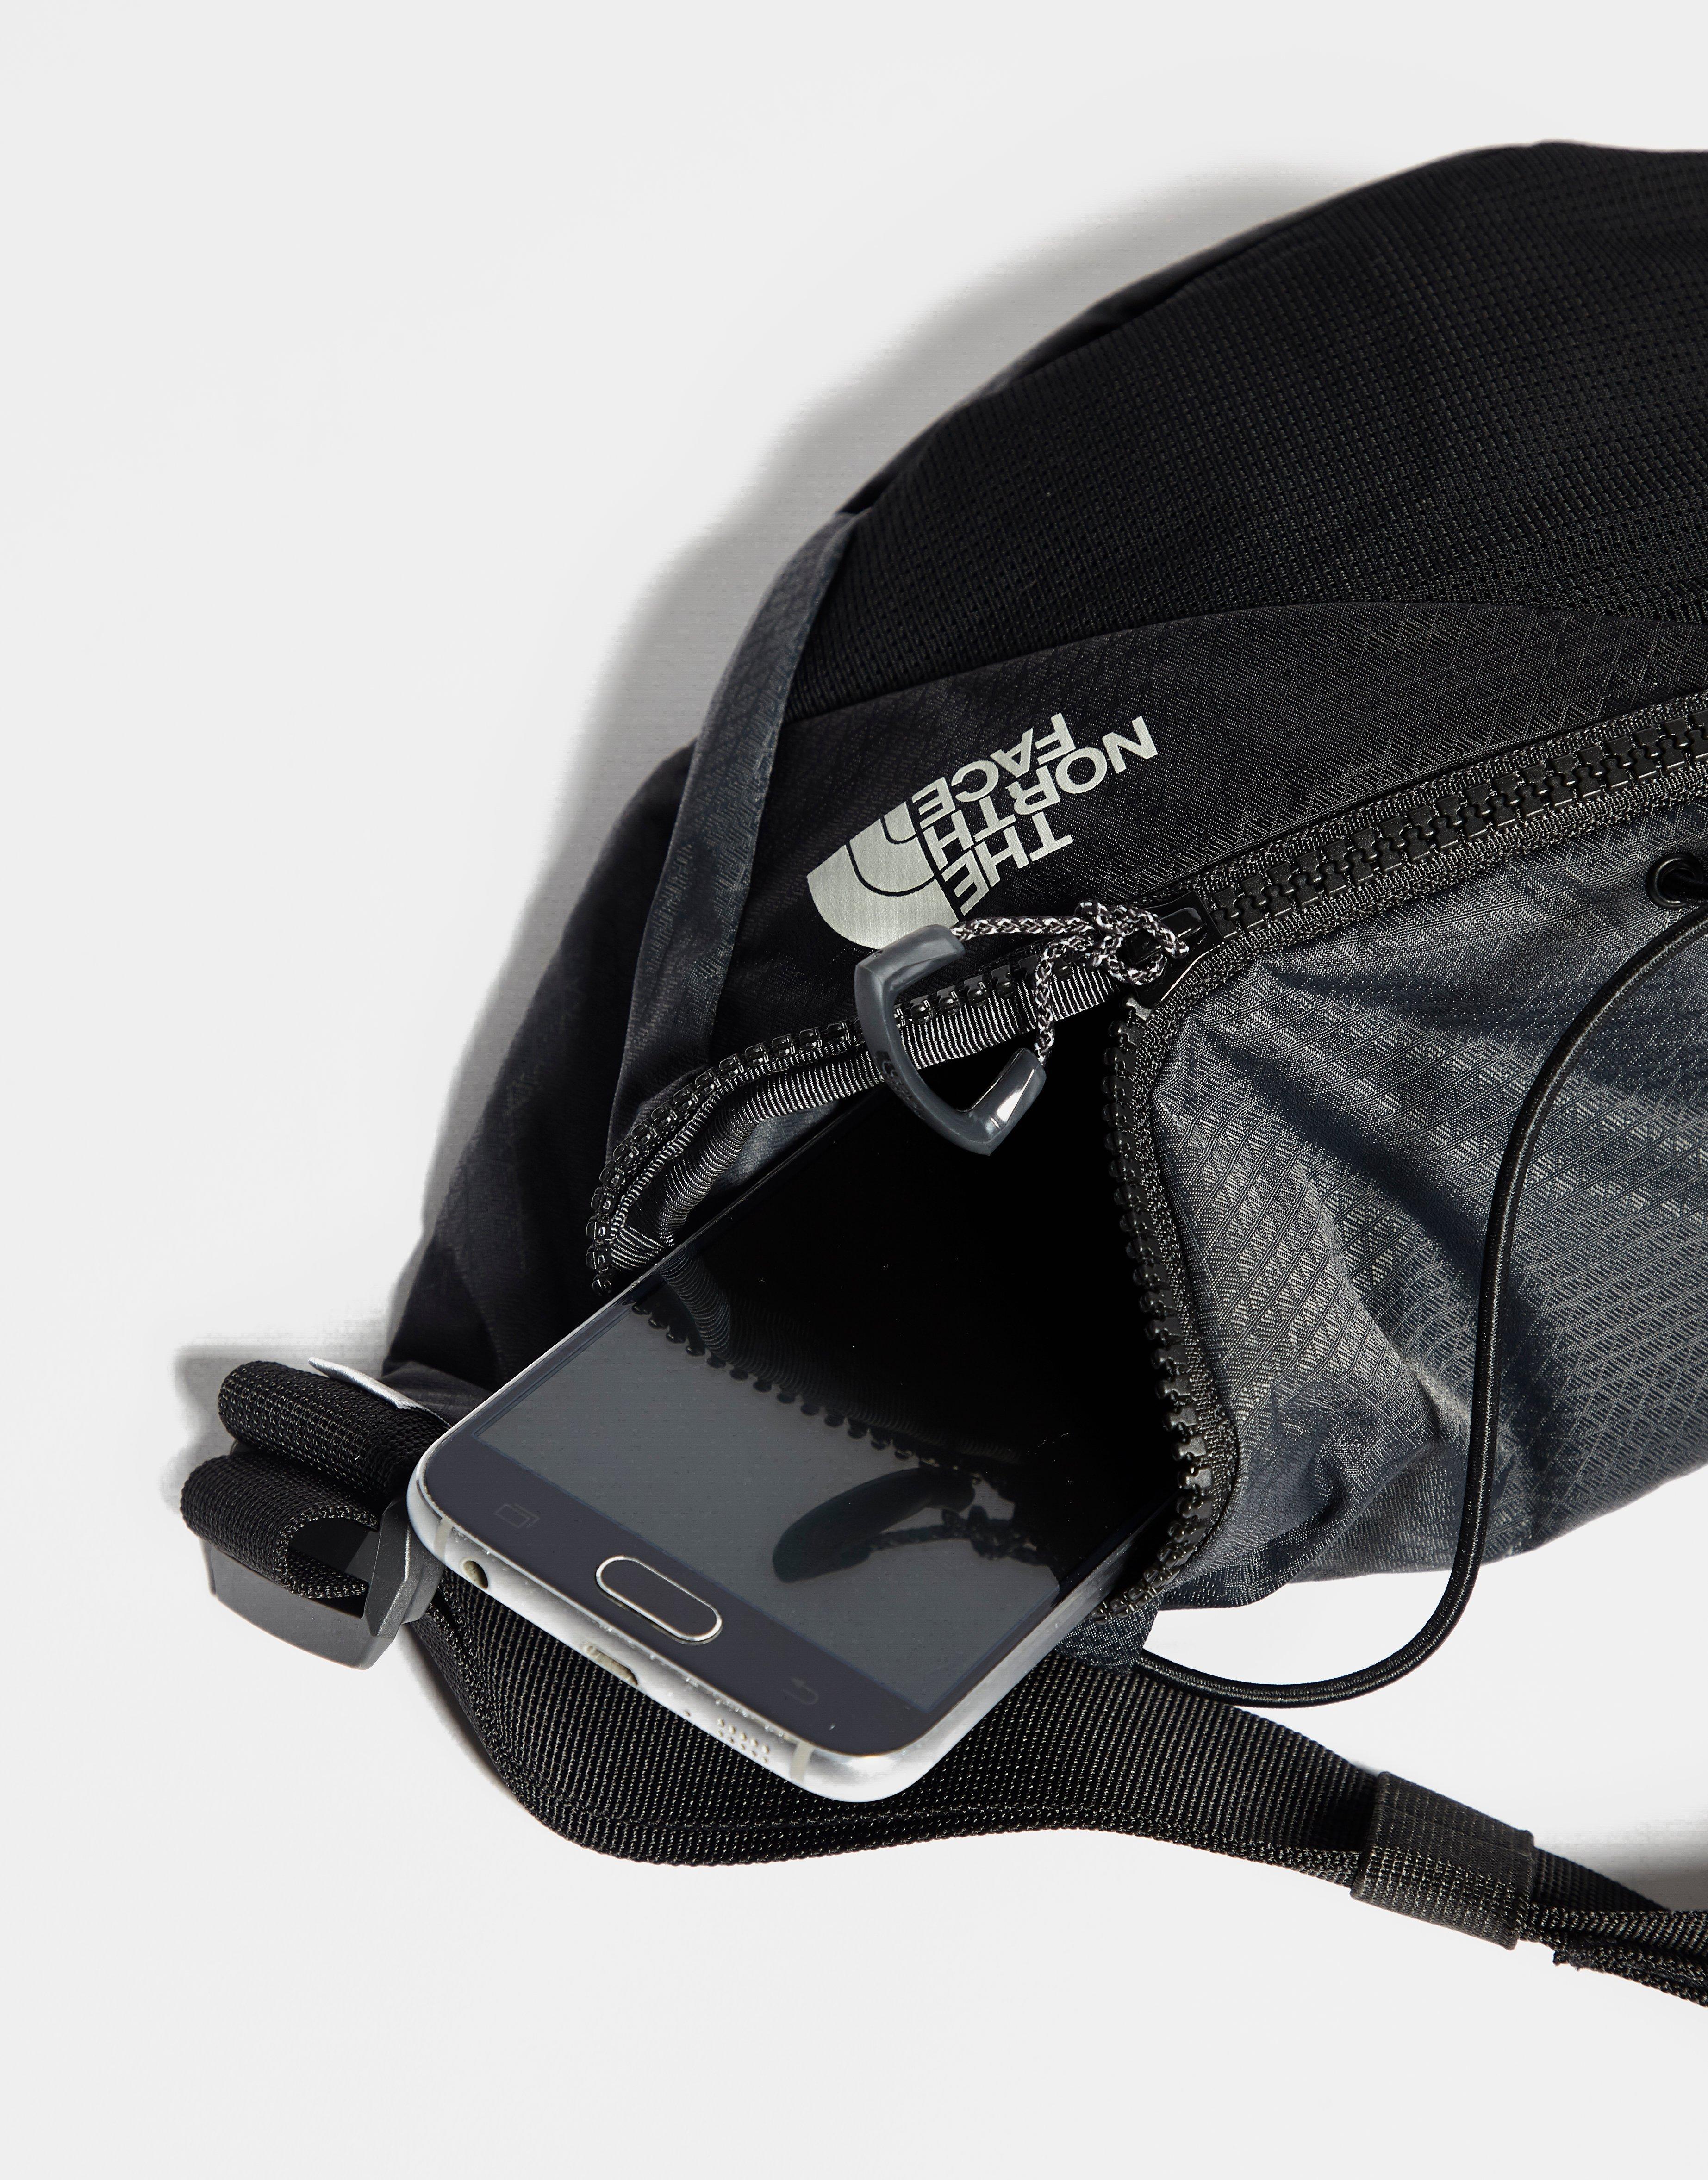 9e4ede0c18 Jd Sports North Face Man Bag